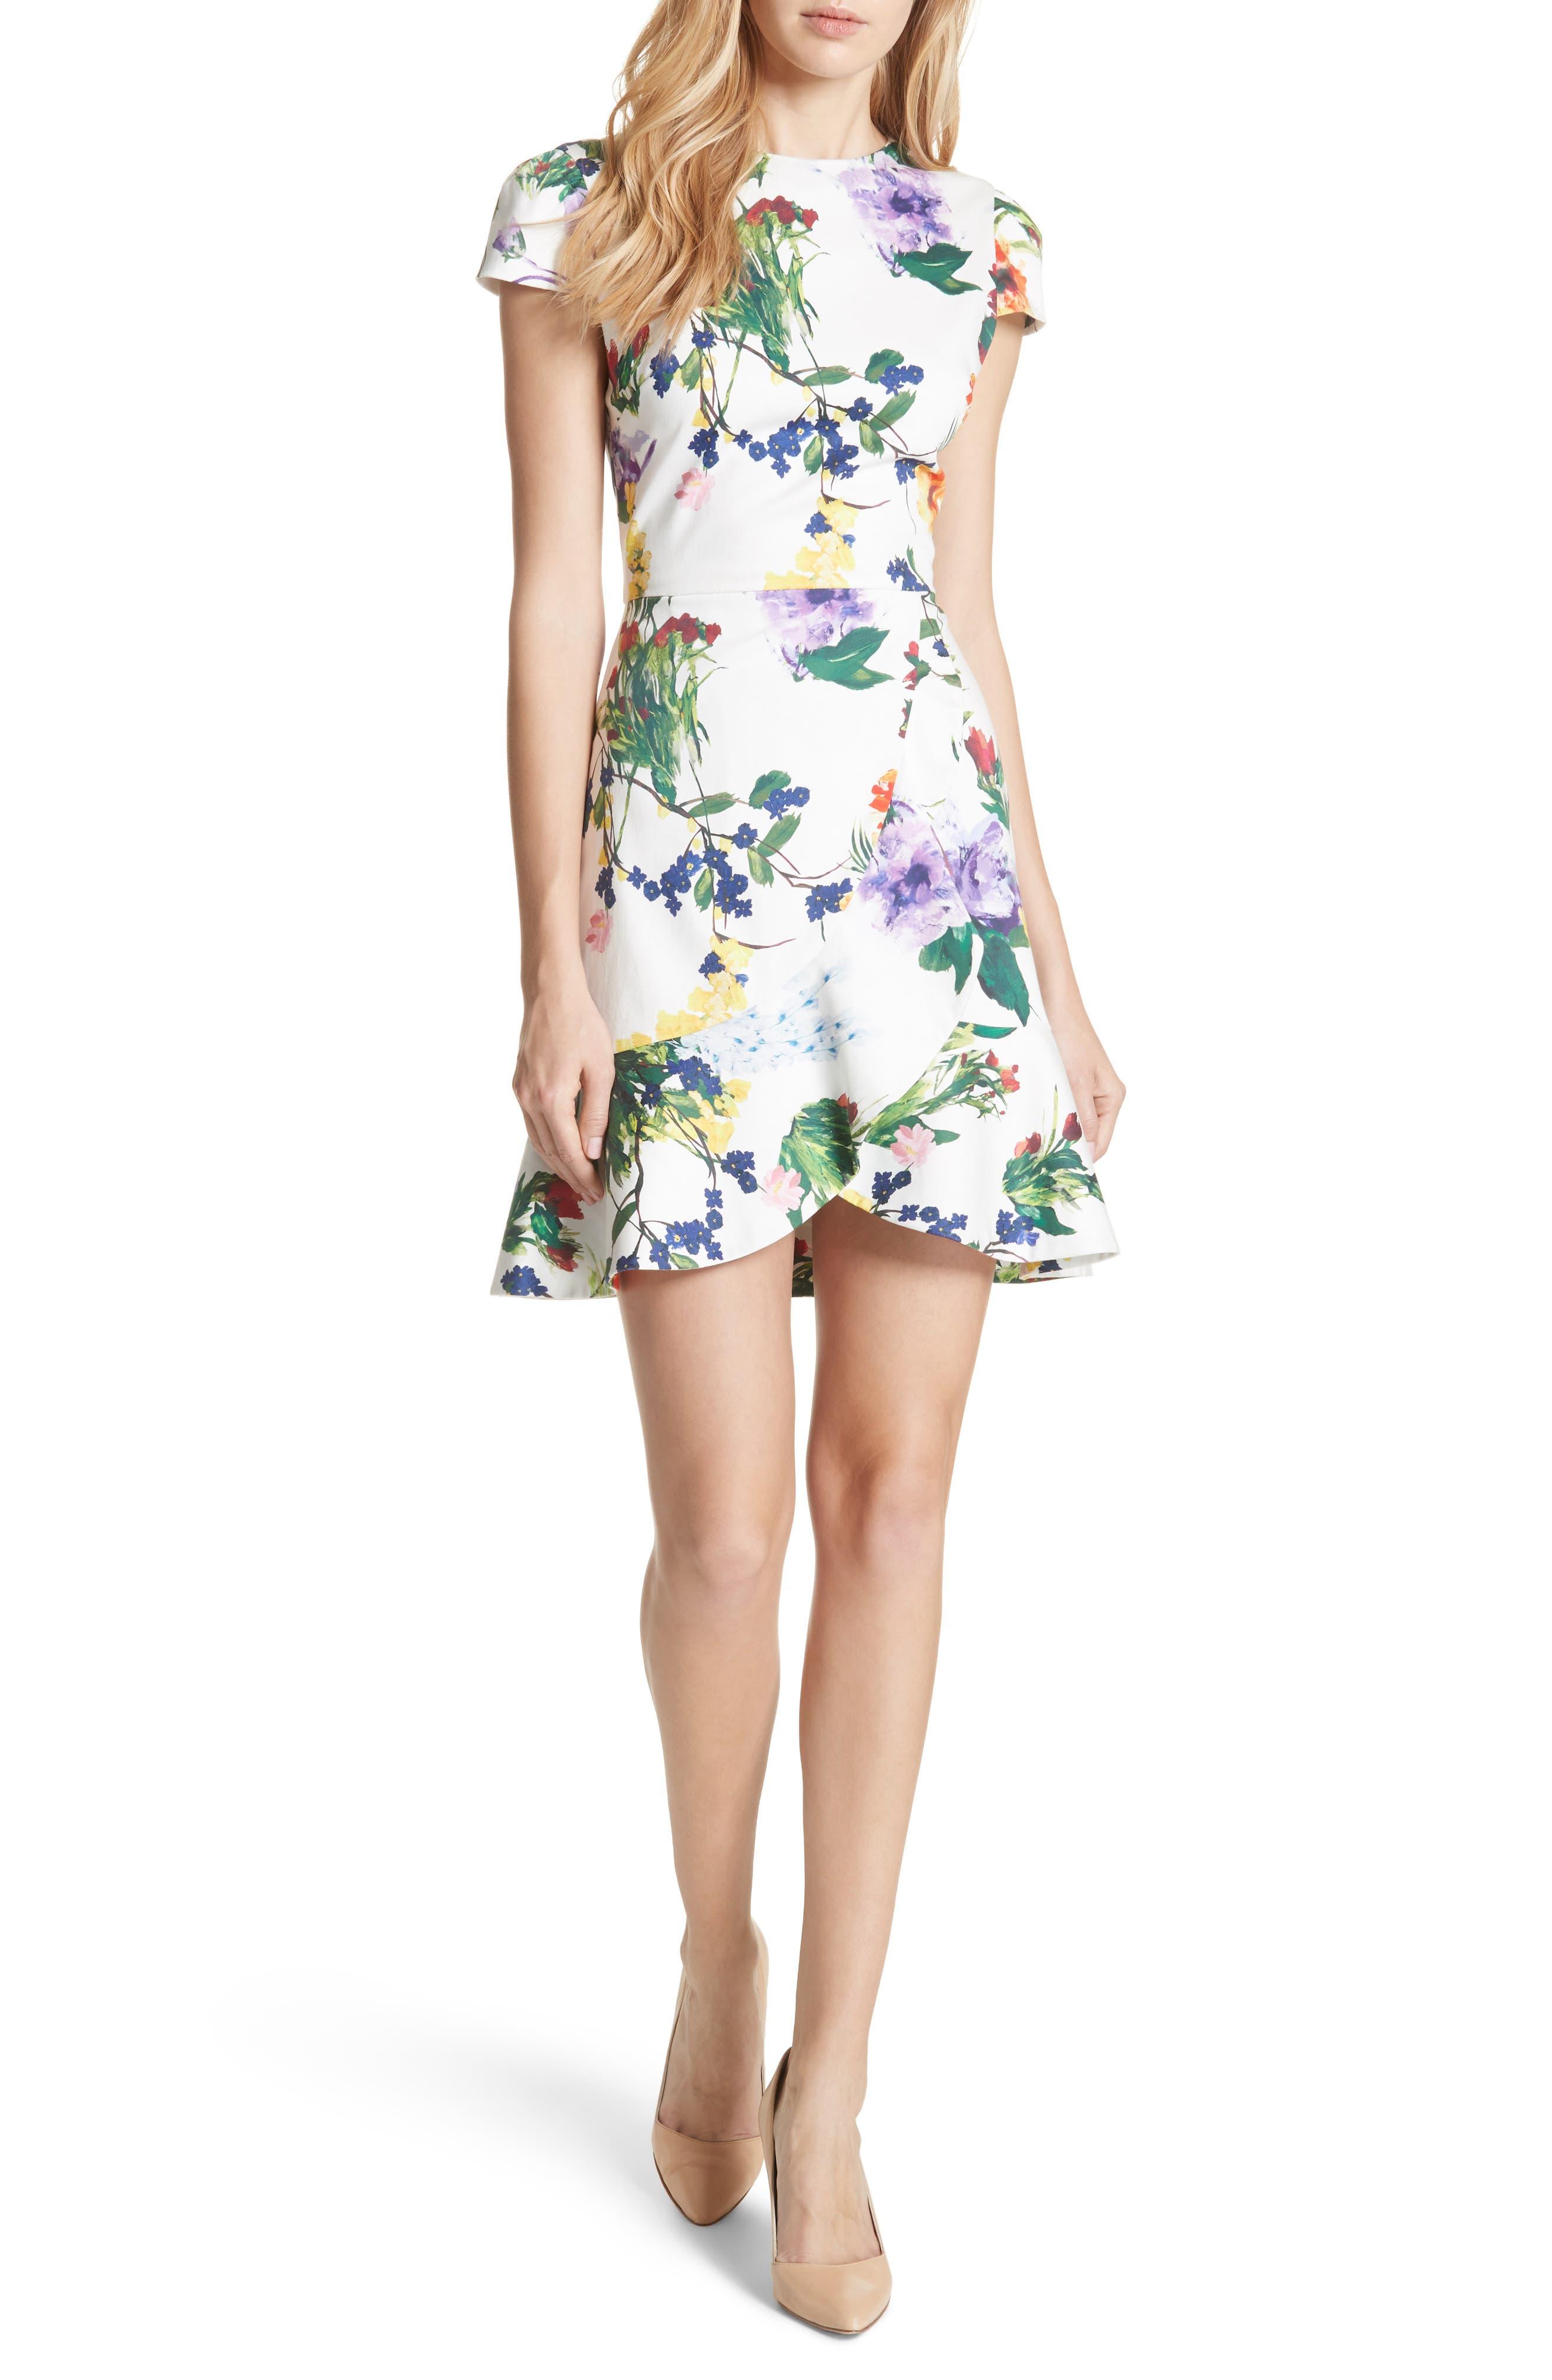 Alice + Olivia Kirby Ruffled Floral Dress